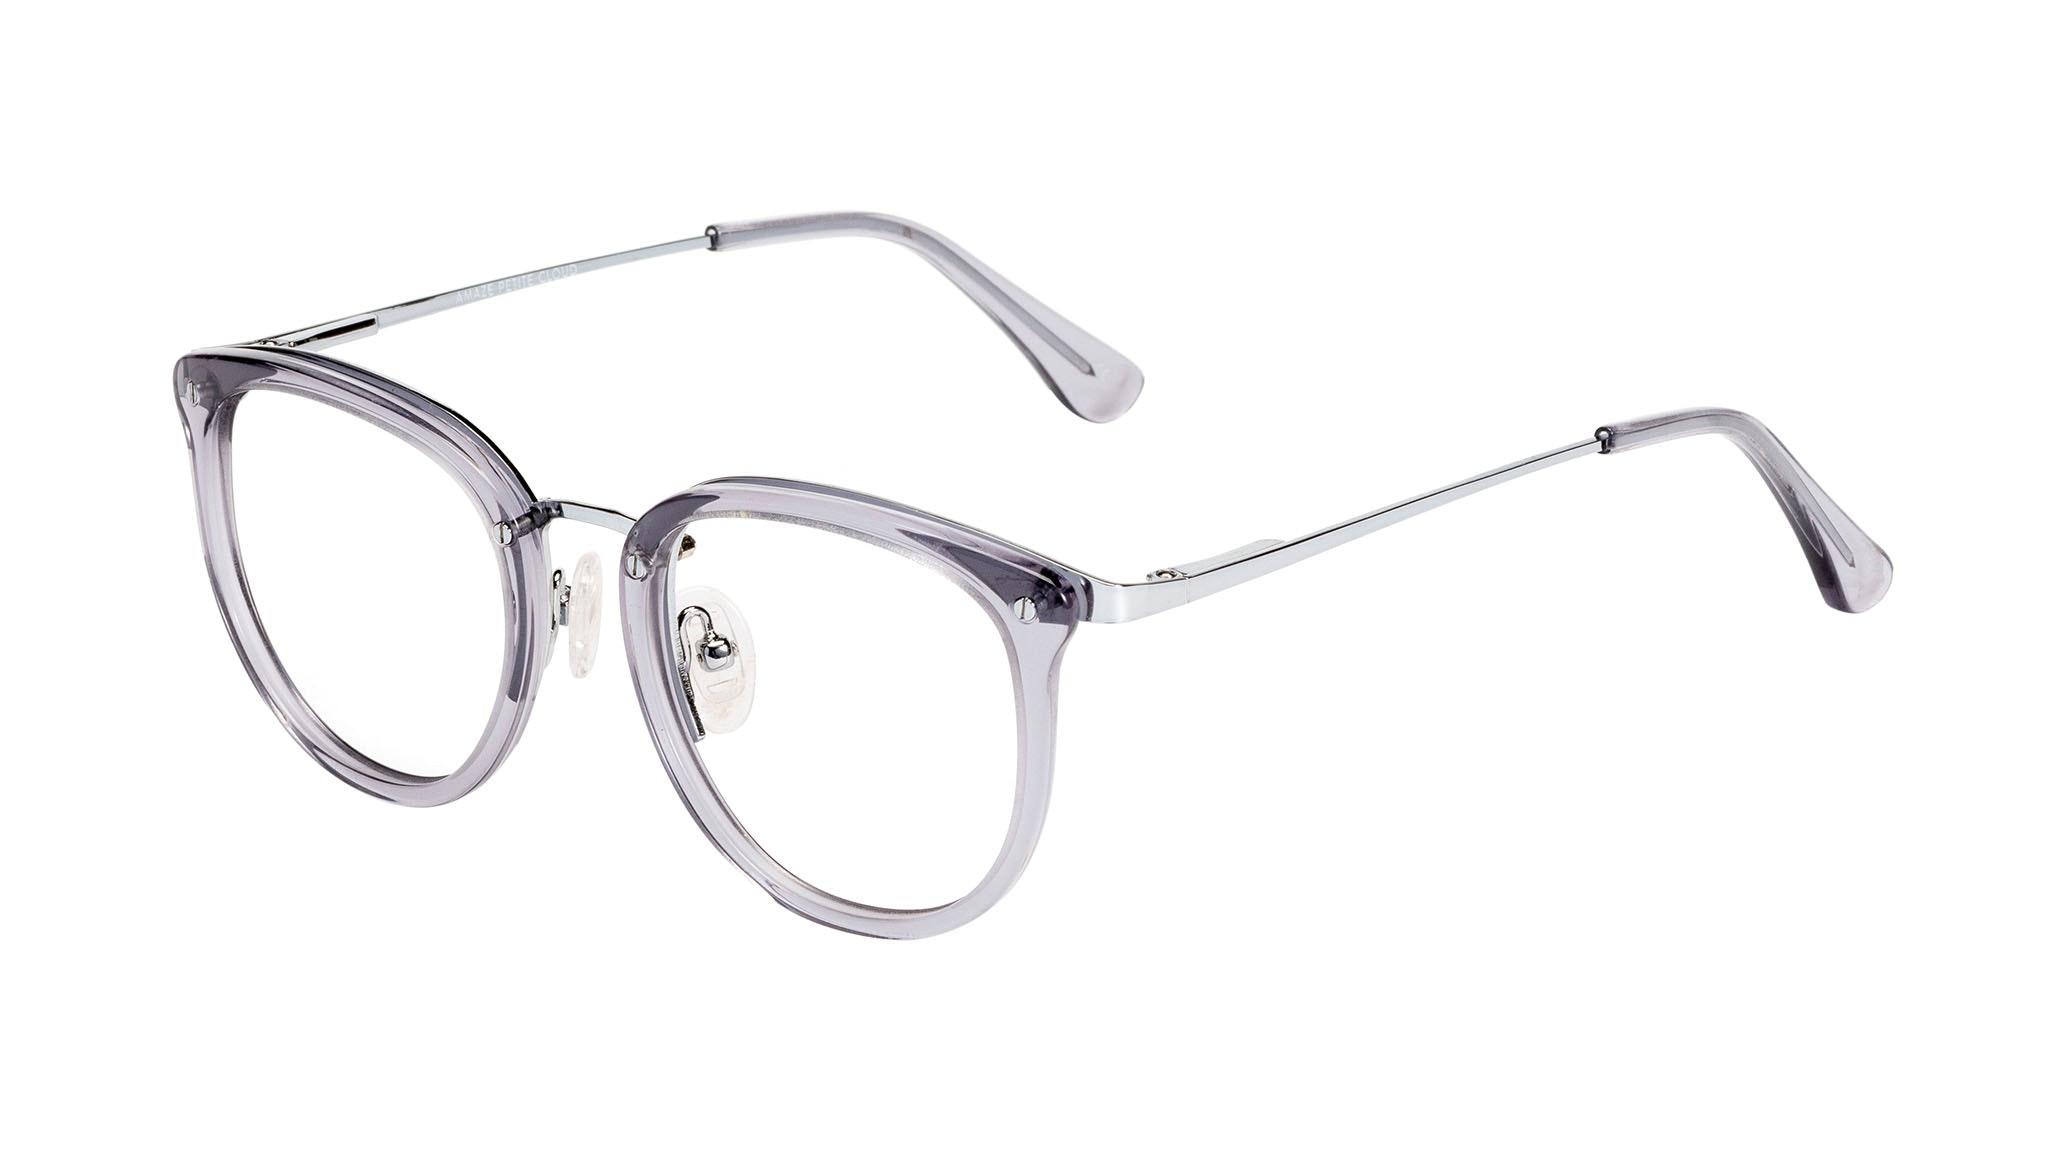 Affordable Fashion Glasses Round Eyeglasses Women Amaze Petite Cloud Tilt